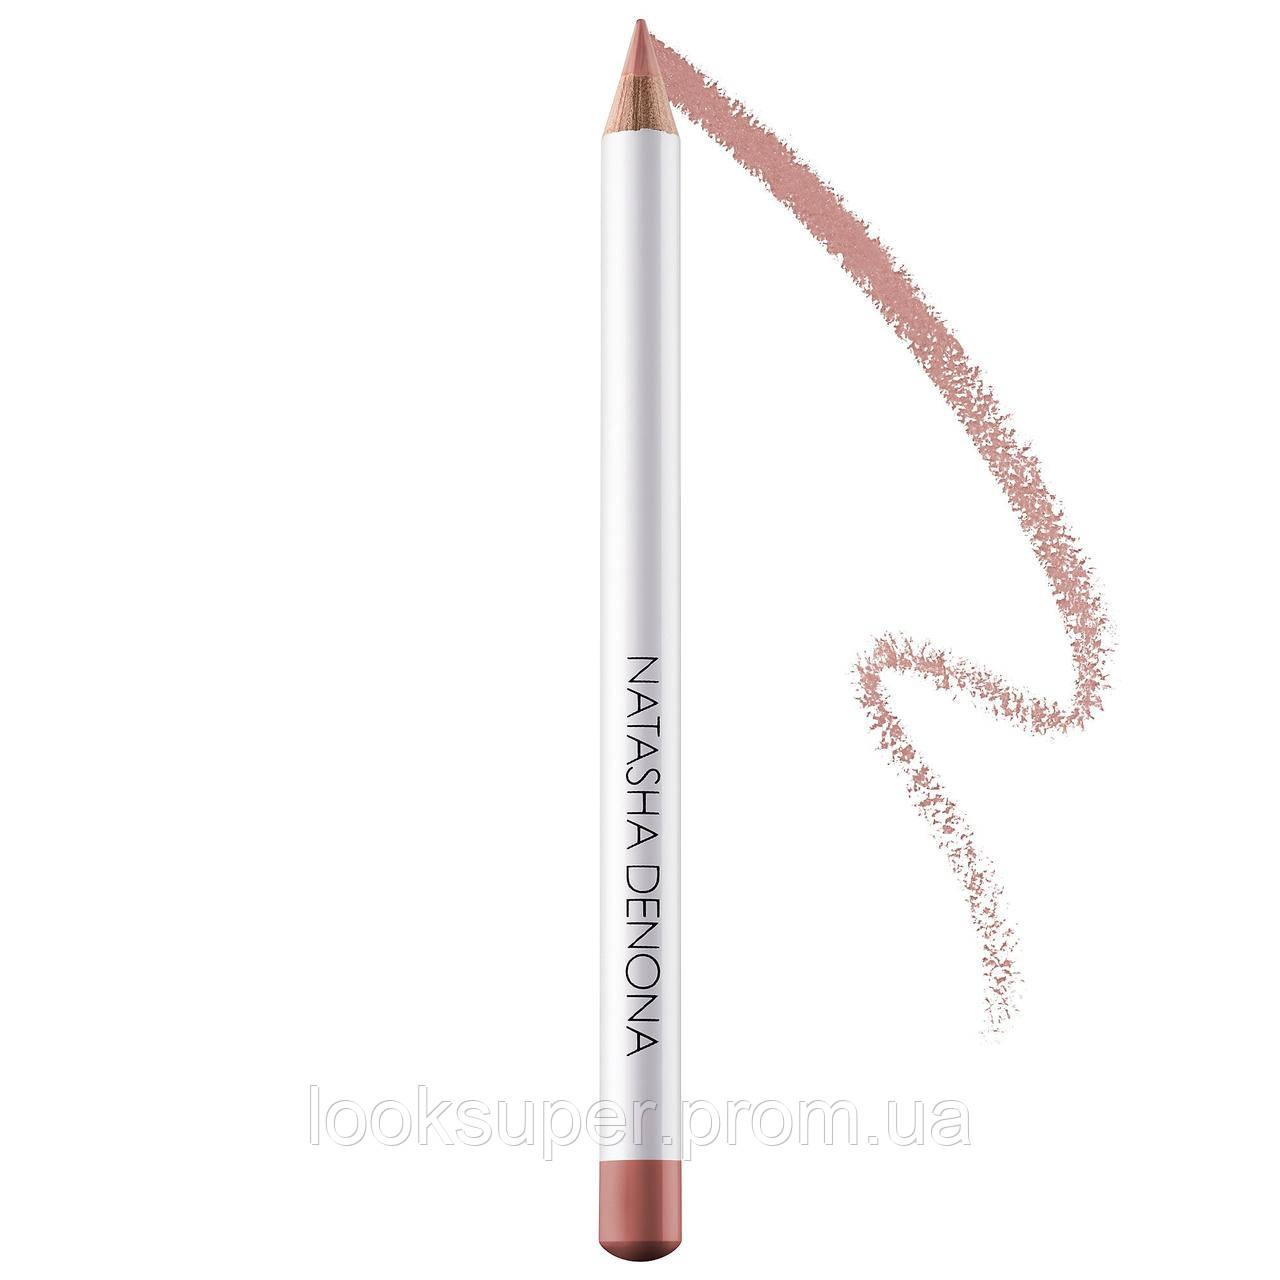 Карандаш для губ  NATASHA DENONA  Lip Liner Pencil  Light Natural